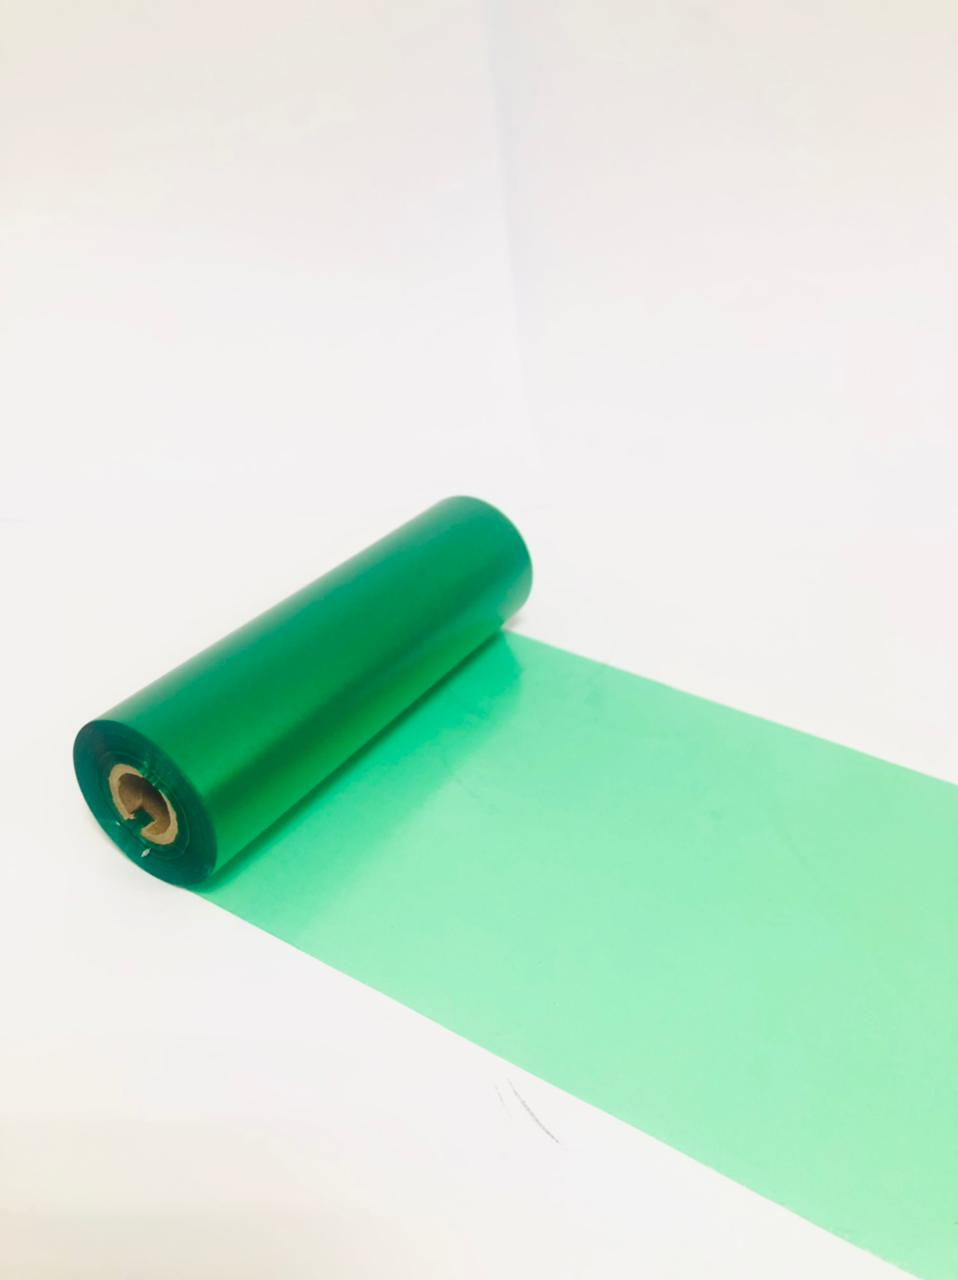 Ribbon Verde Cera/Resina 110mmX74m C70 Out - TTR - 0,5